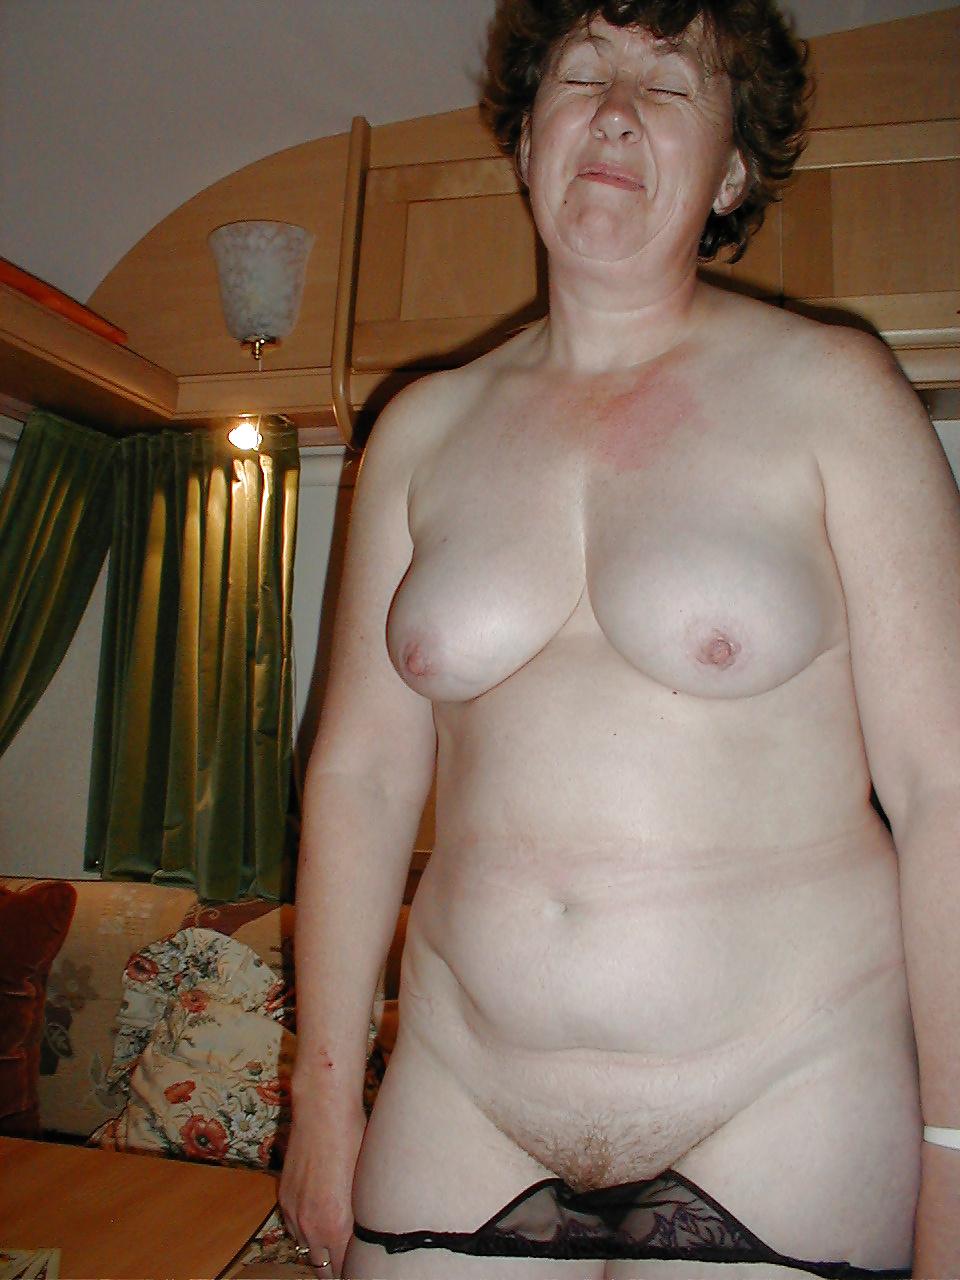 Housewife Sexy Strip Poker - 13 Pics - Xhamstercom-5058